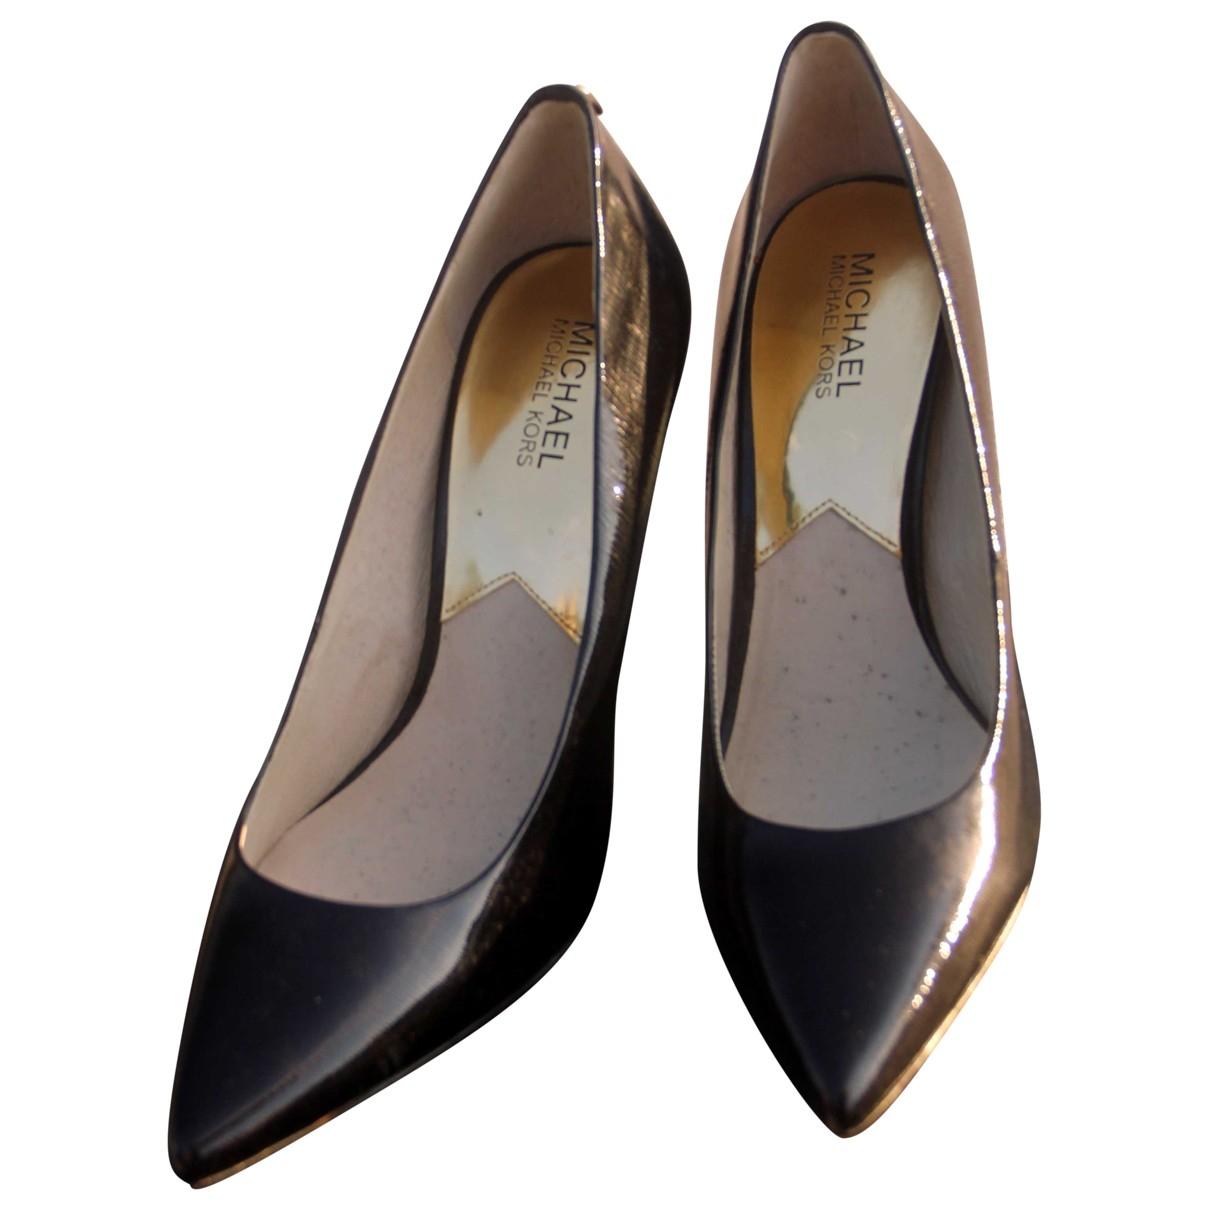 Michael Kors \N Black Leather Heels for Women 10.5 US